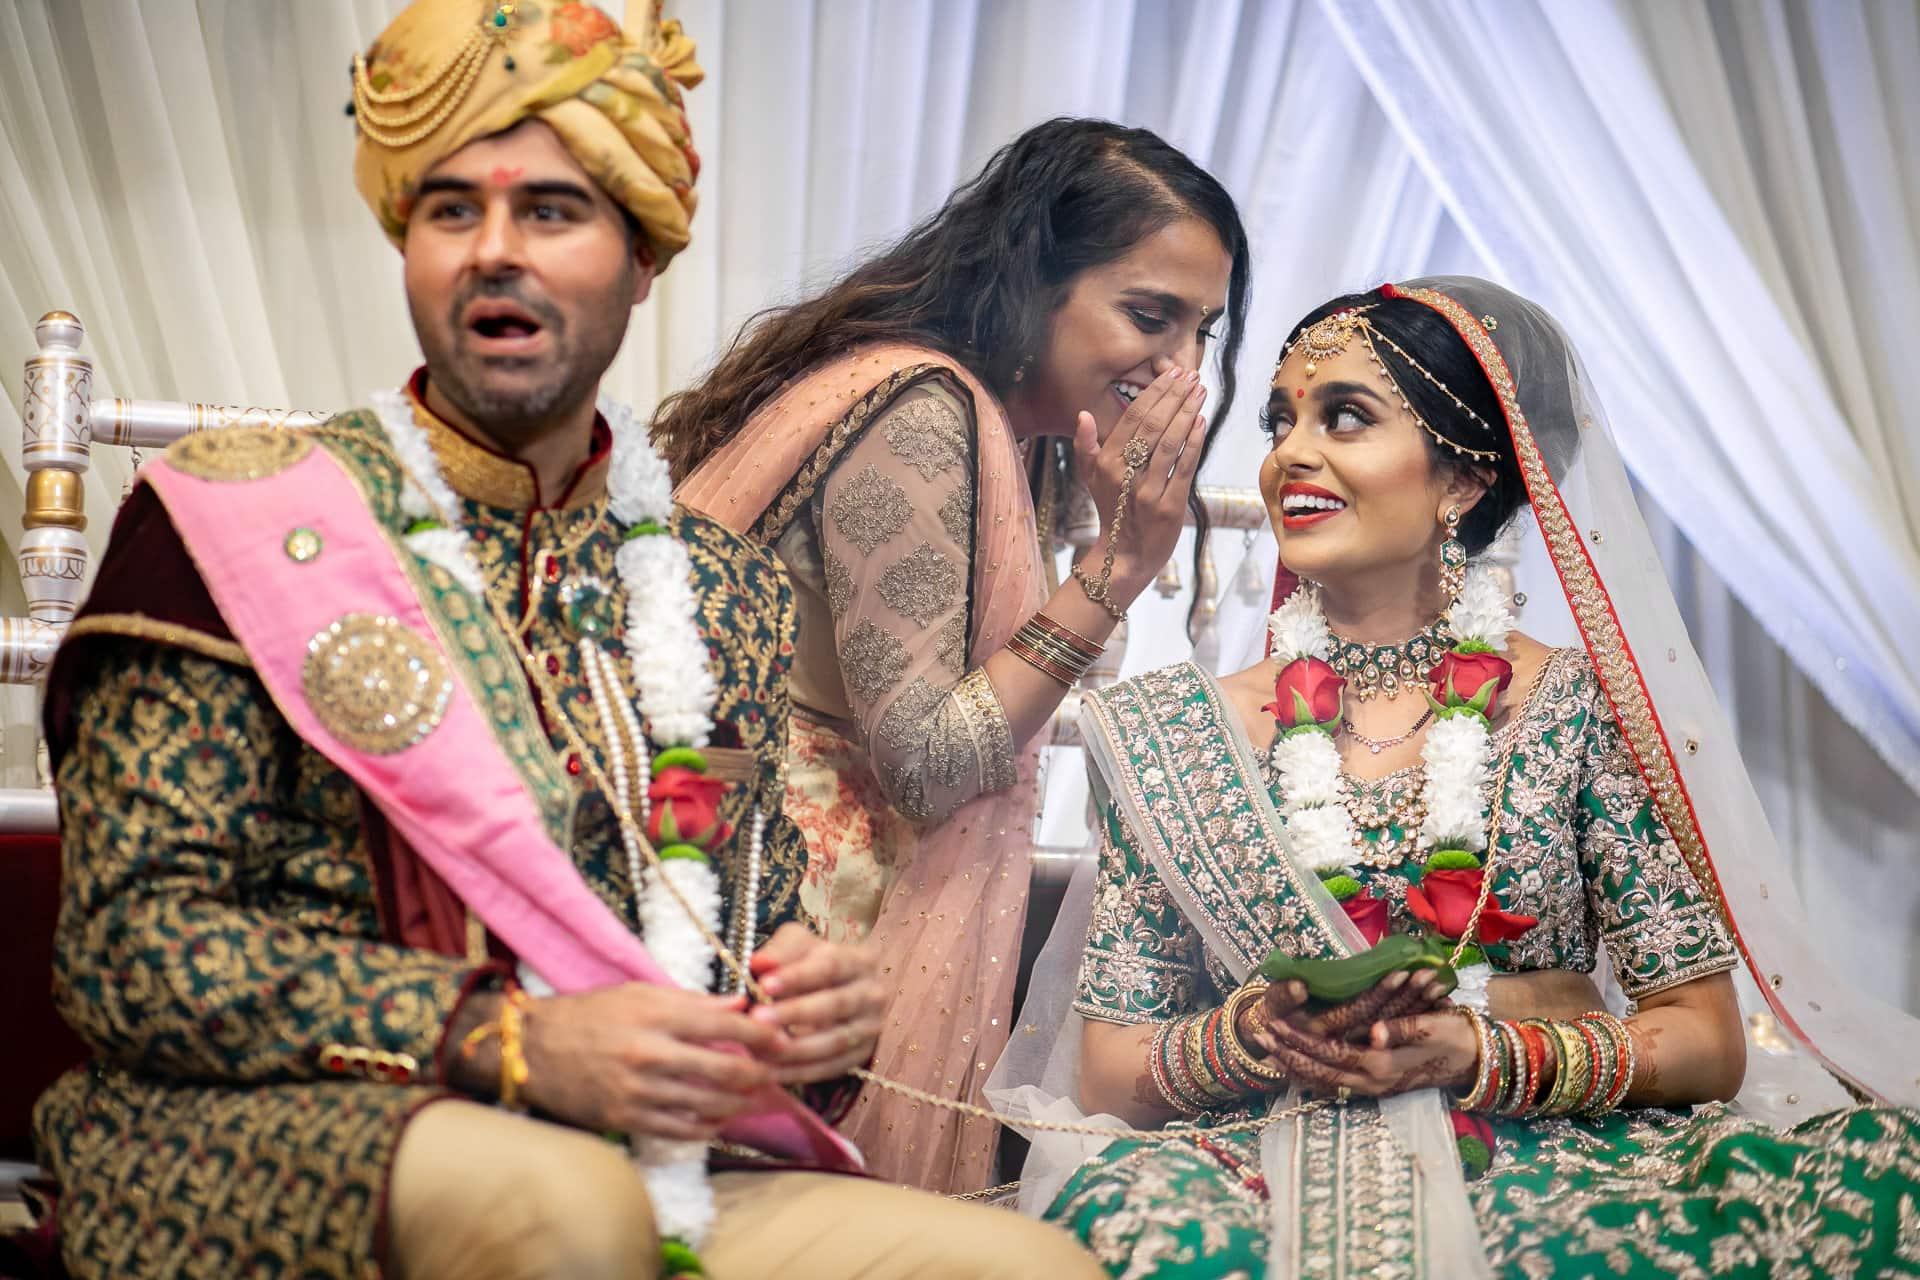 Hindu wedding ceremony at The Haveli